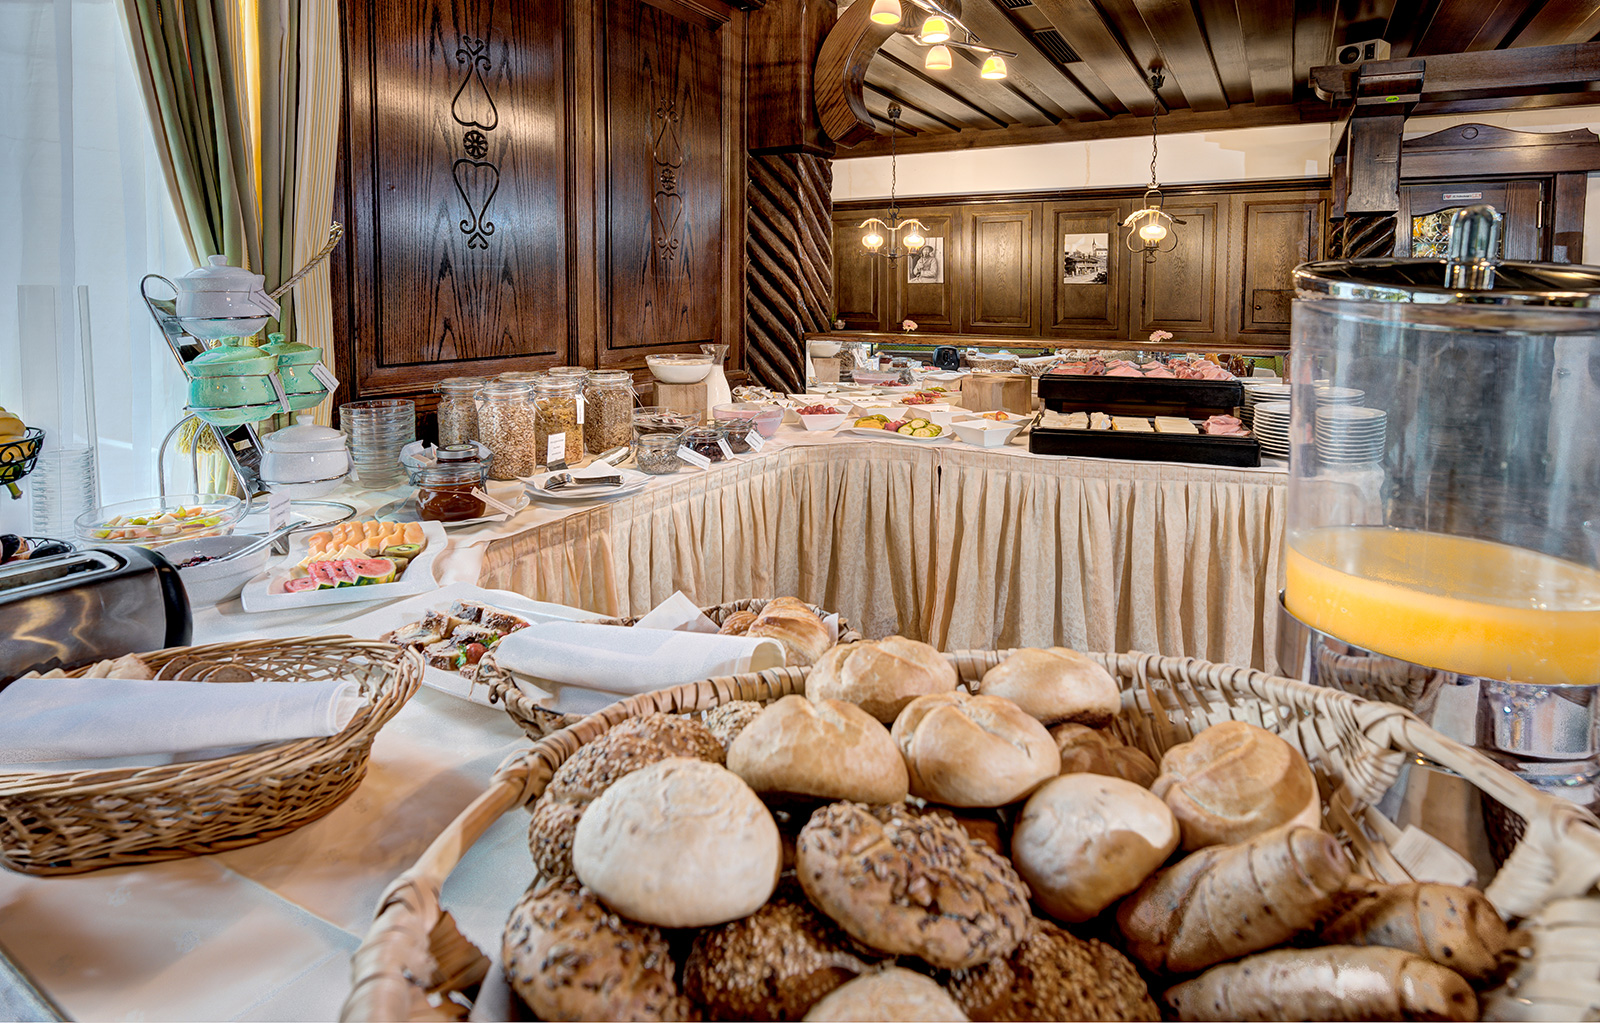 Frühstücksbuffet im Hotel Martini